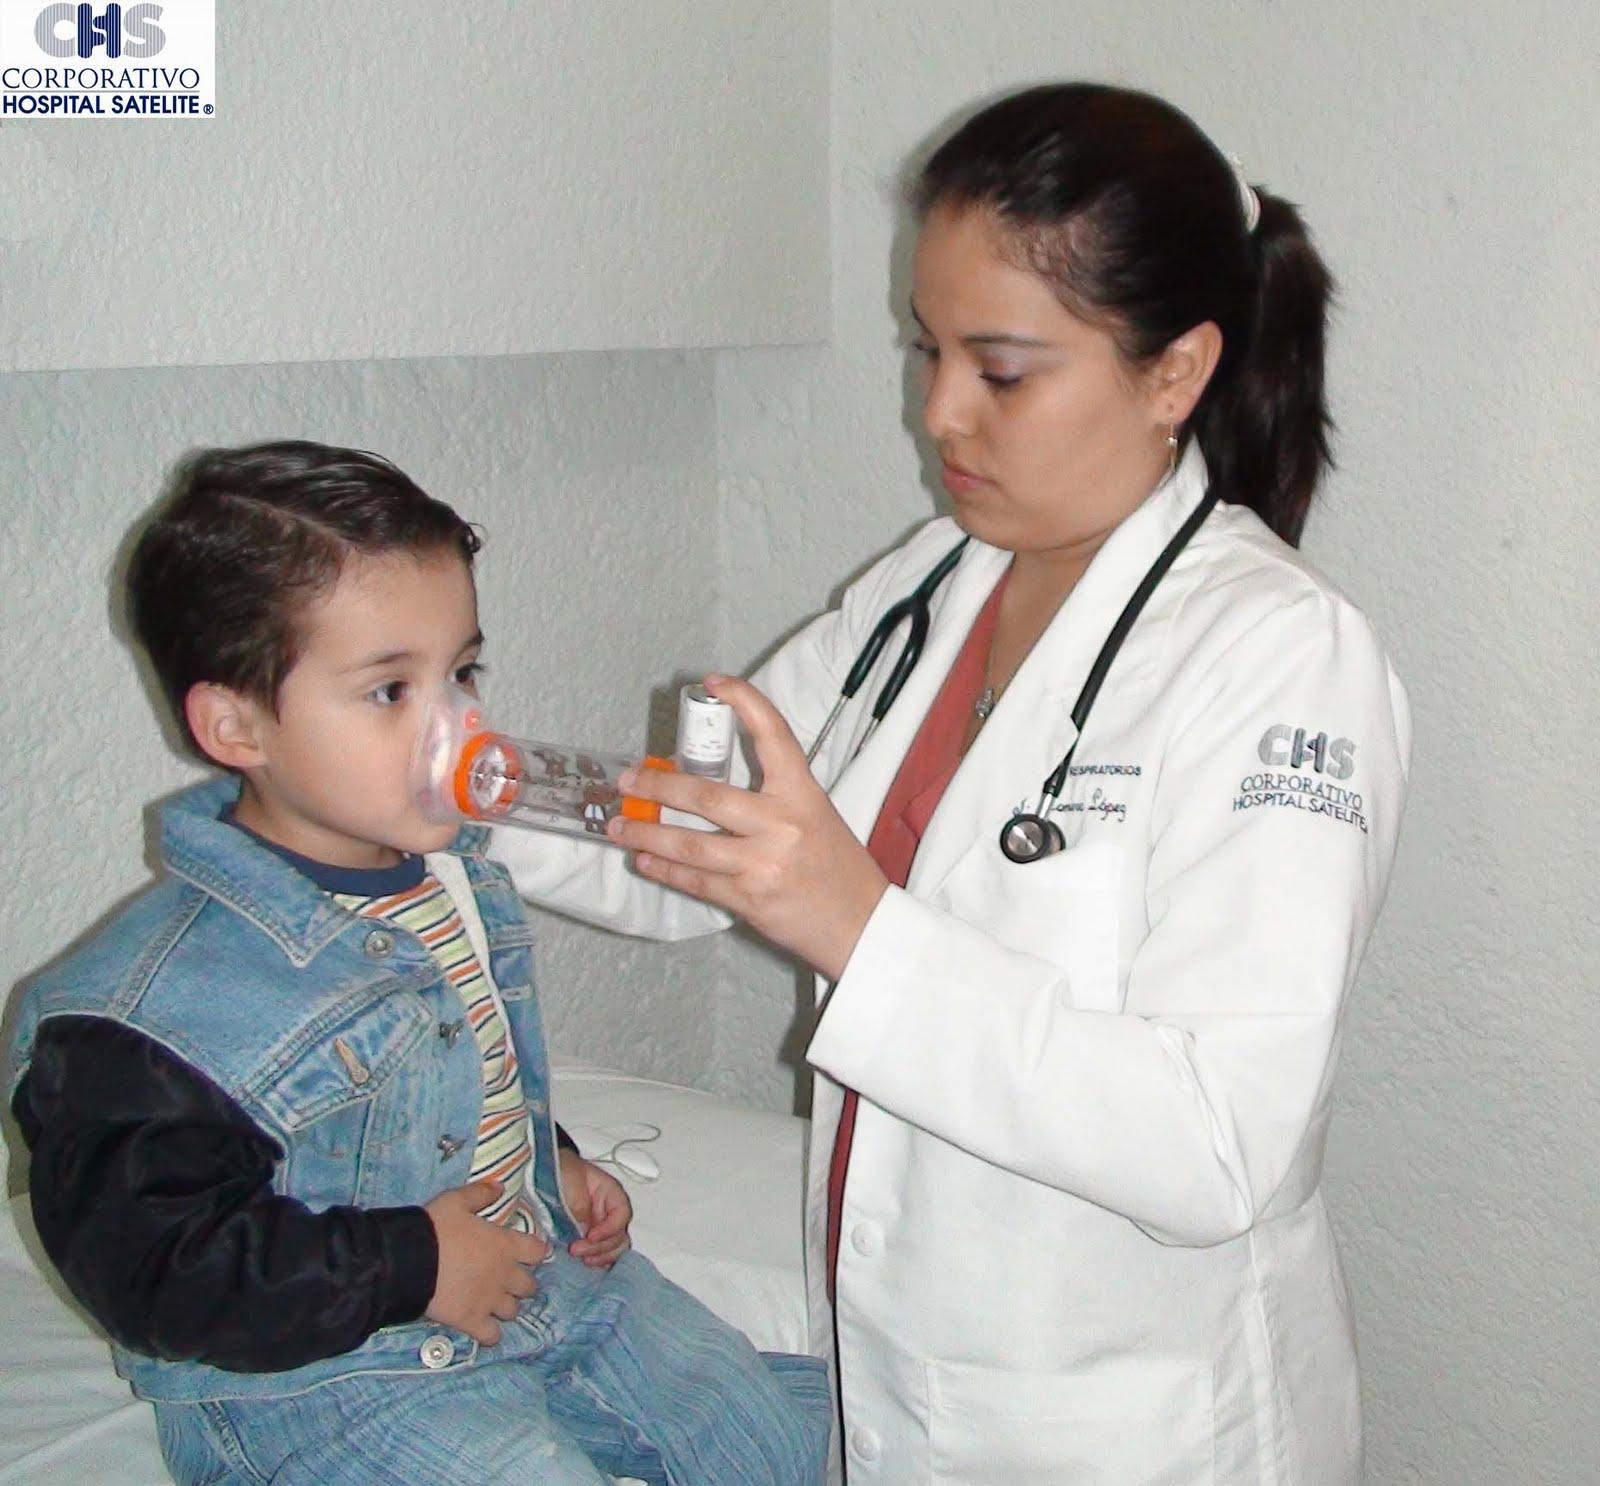 Corporativo Hospital Satélite: 2010